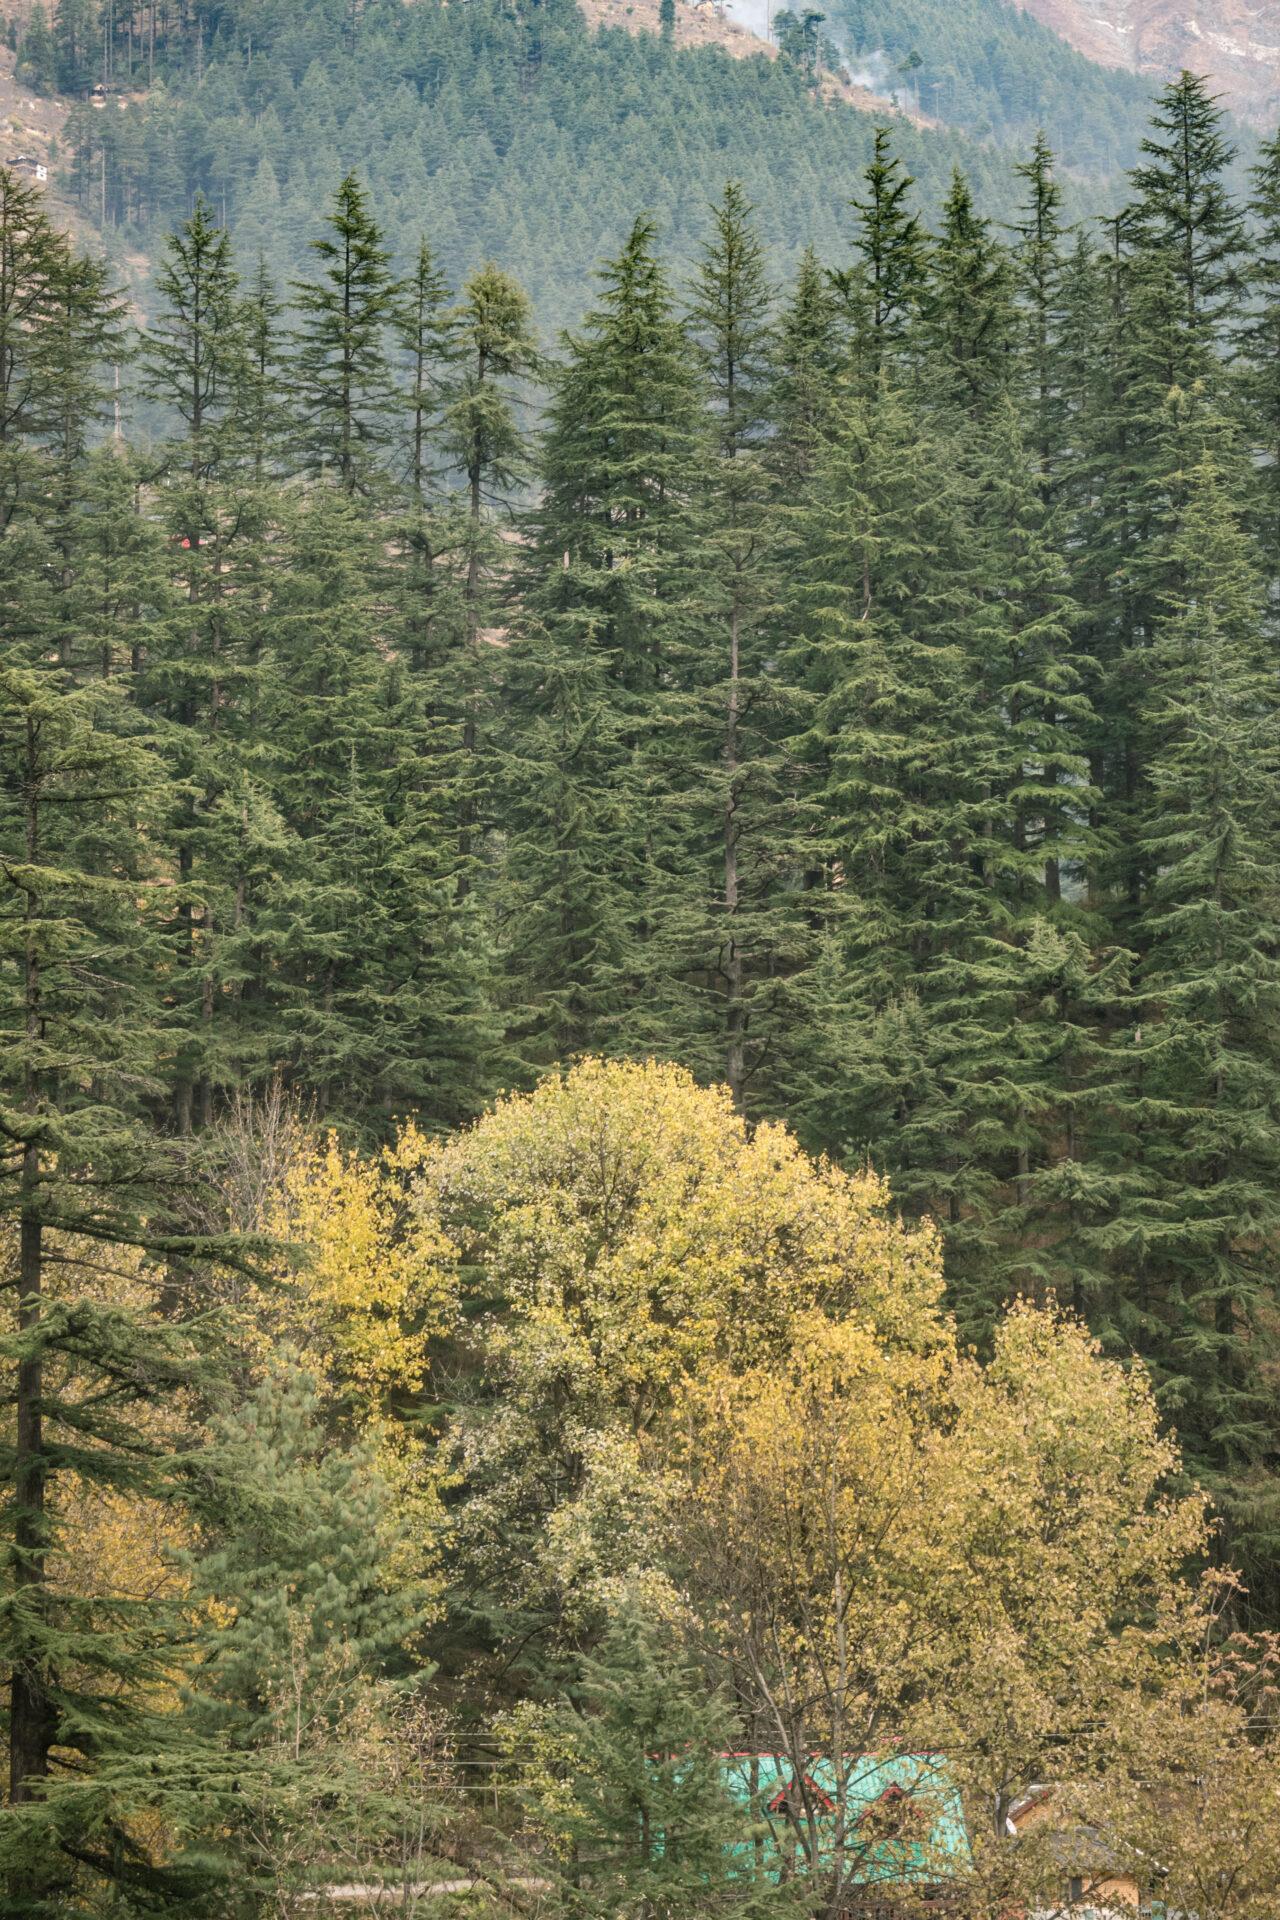 Tall Oak Trees in the Jibhi Valley